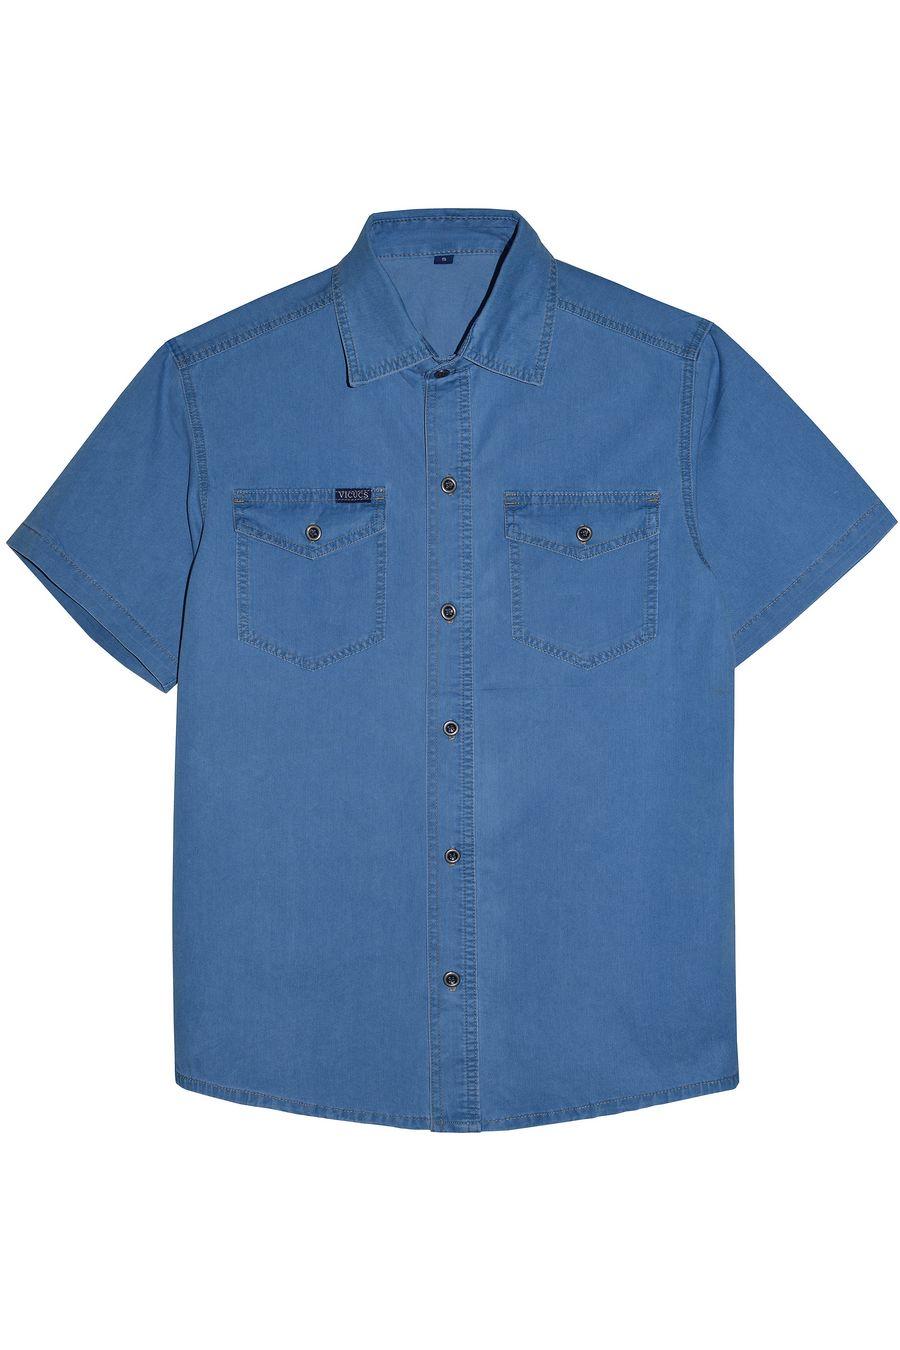 Рубашка мужская Vicucs 728E/CT-321-20 (S-2XL) - фото 1